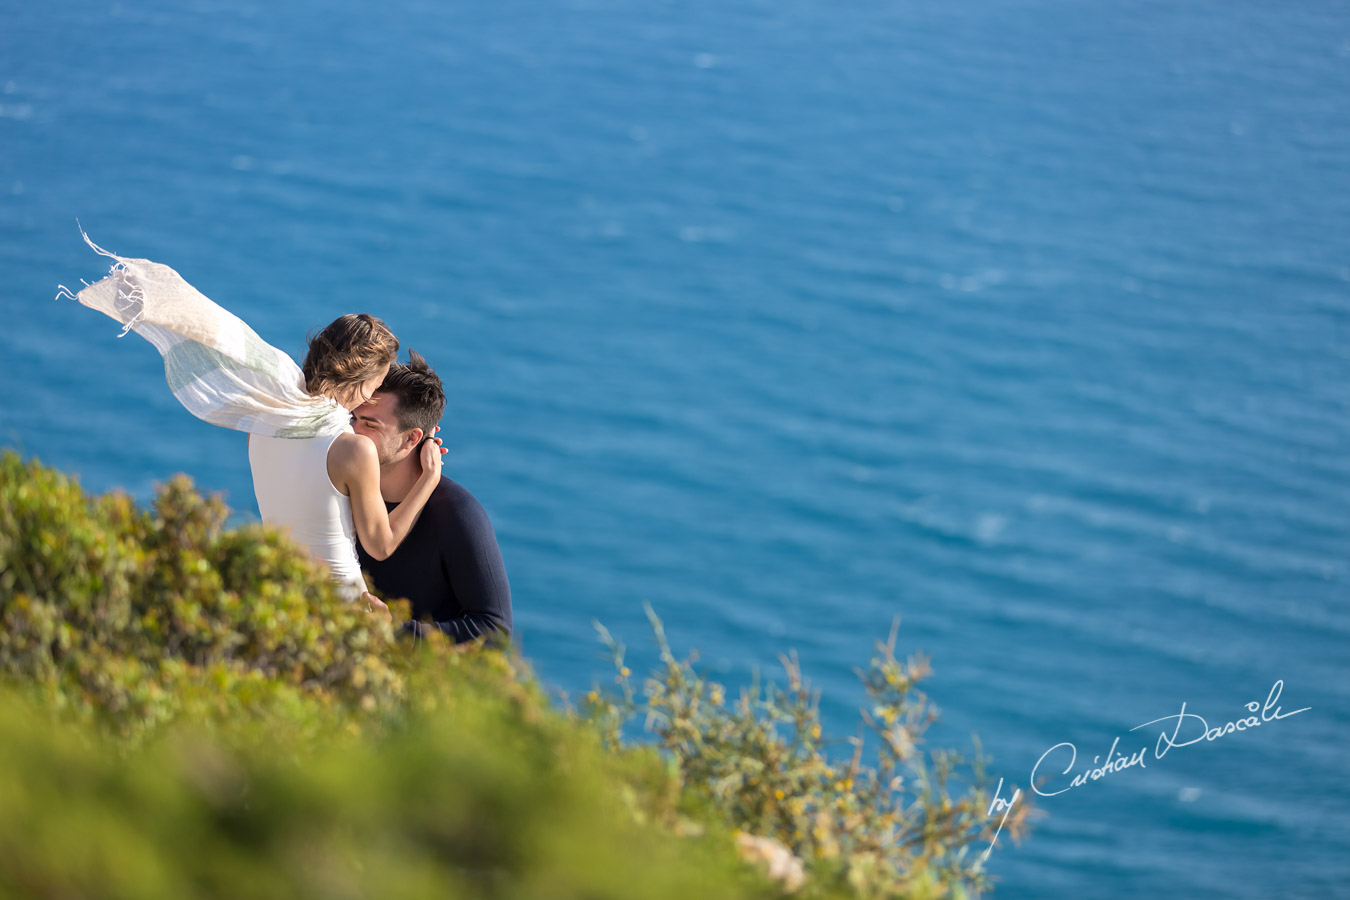 Love at first sight - Karen & Martins at Kurion Cyprus - 10